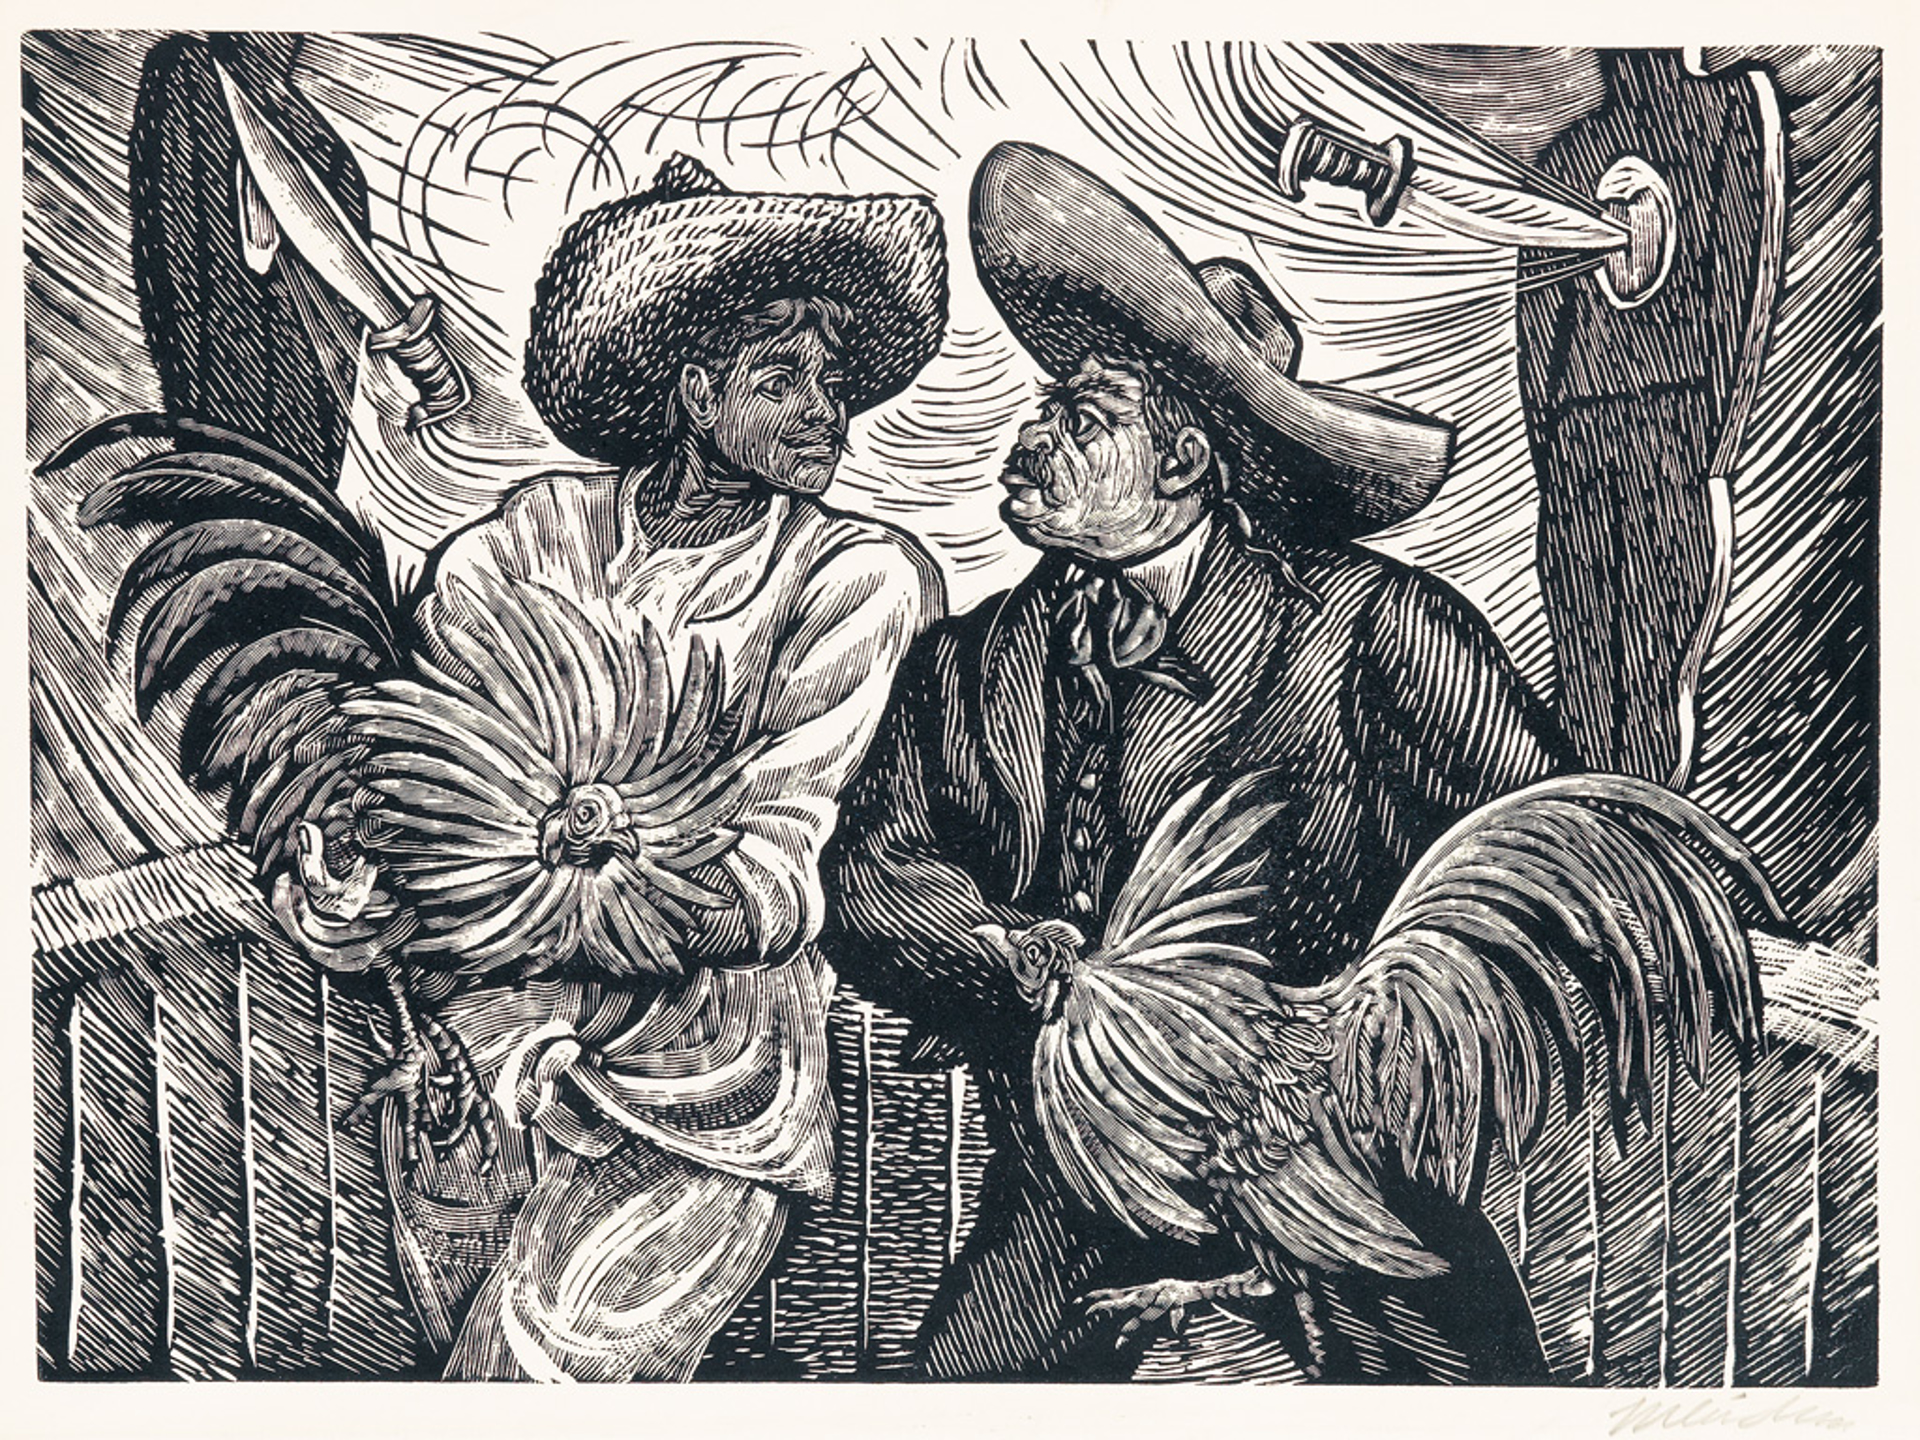 Dos Galleros by Leopoldo Méndez (1902 - 1969)